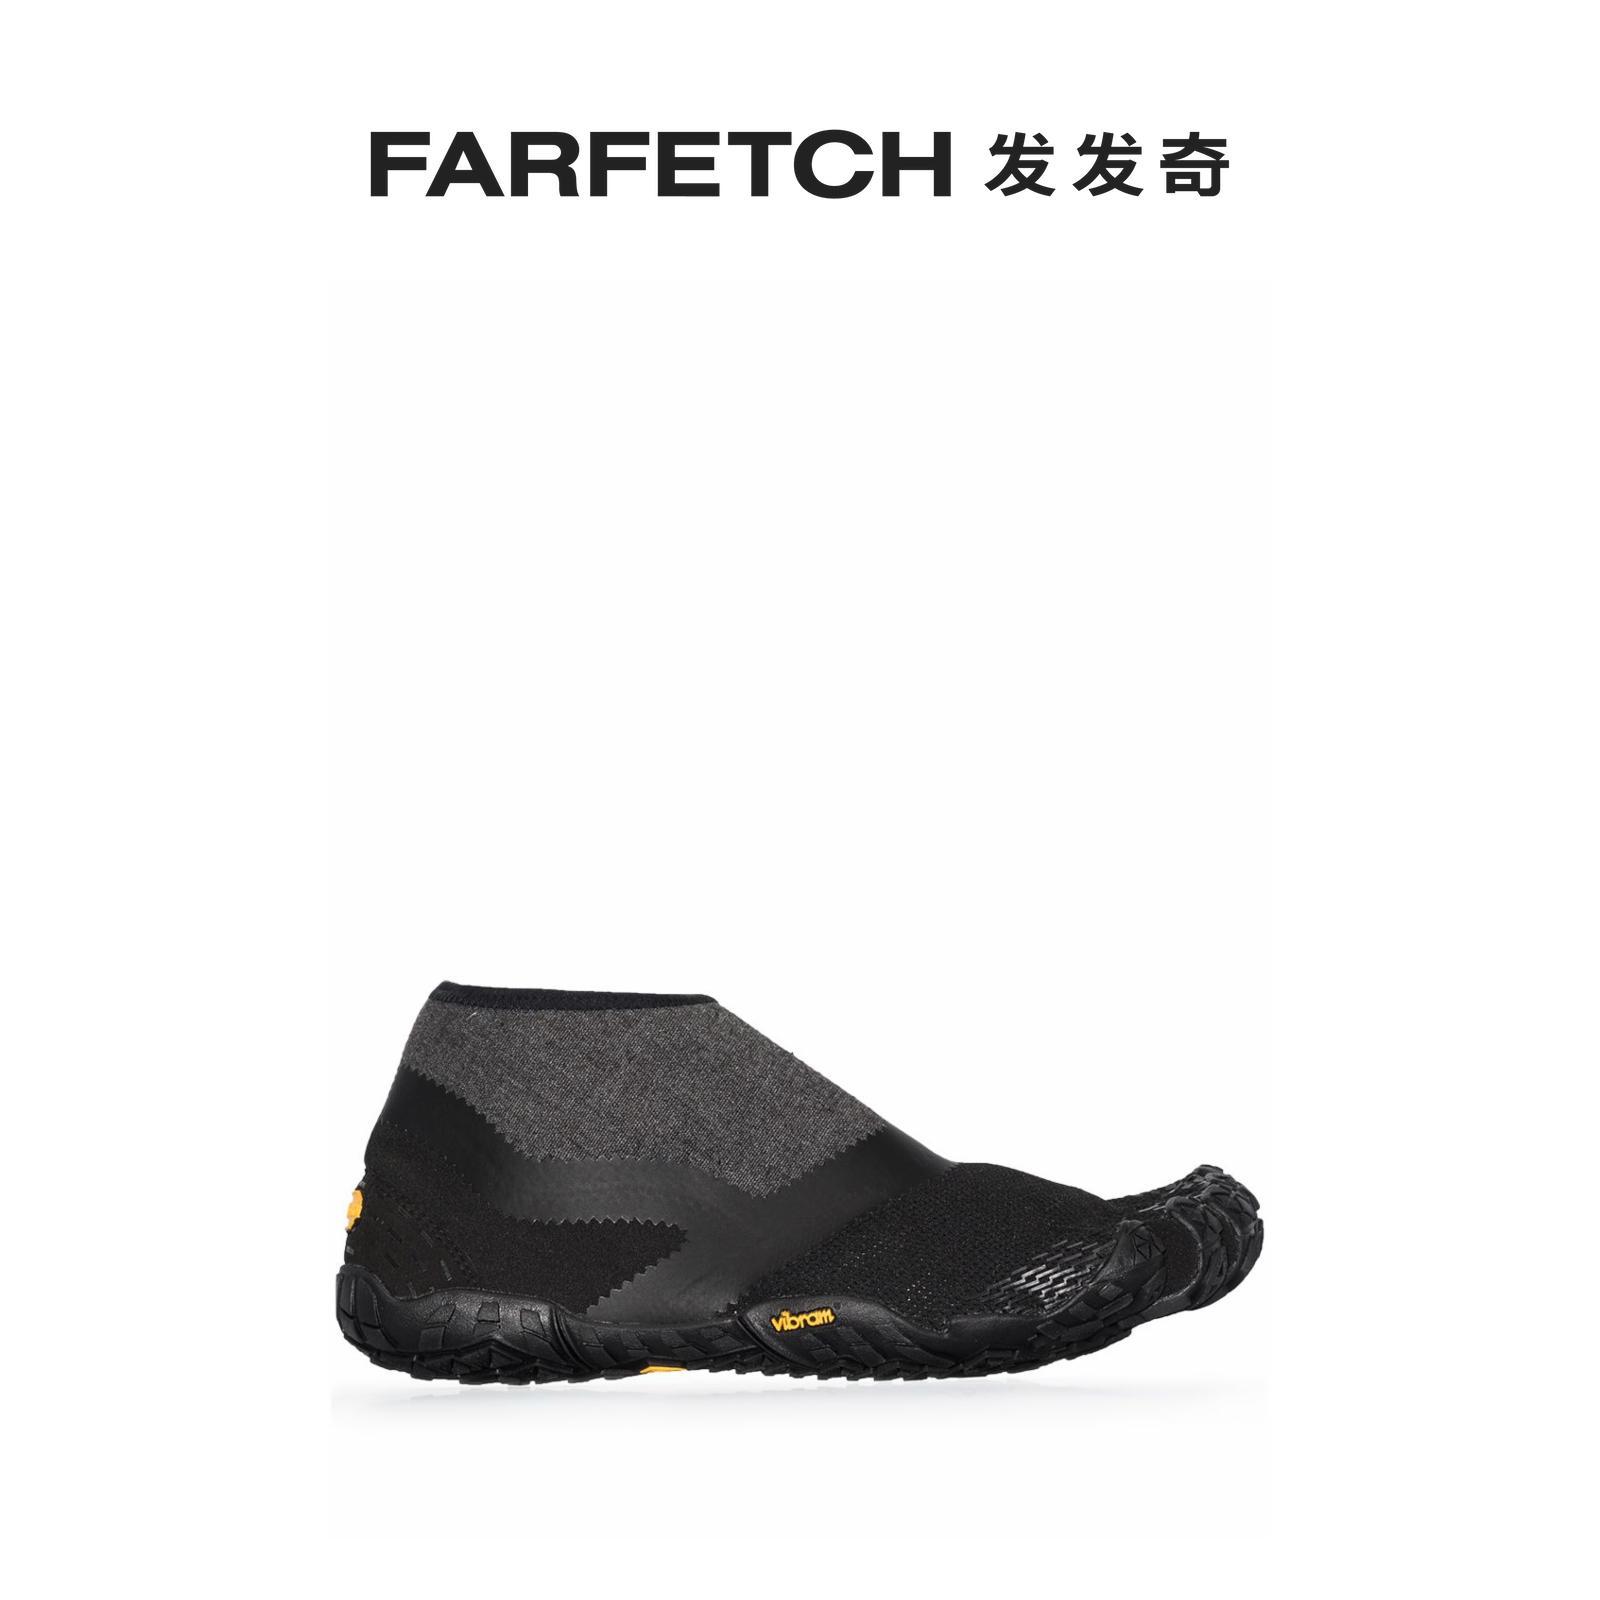 [新品]Suicoke男士Nin Lo 橡胶鞋底运动鞋FARFETCH发发奇